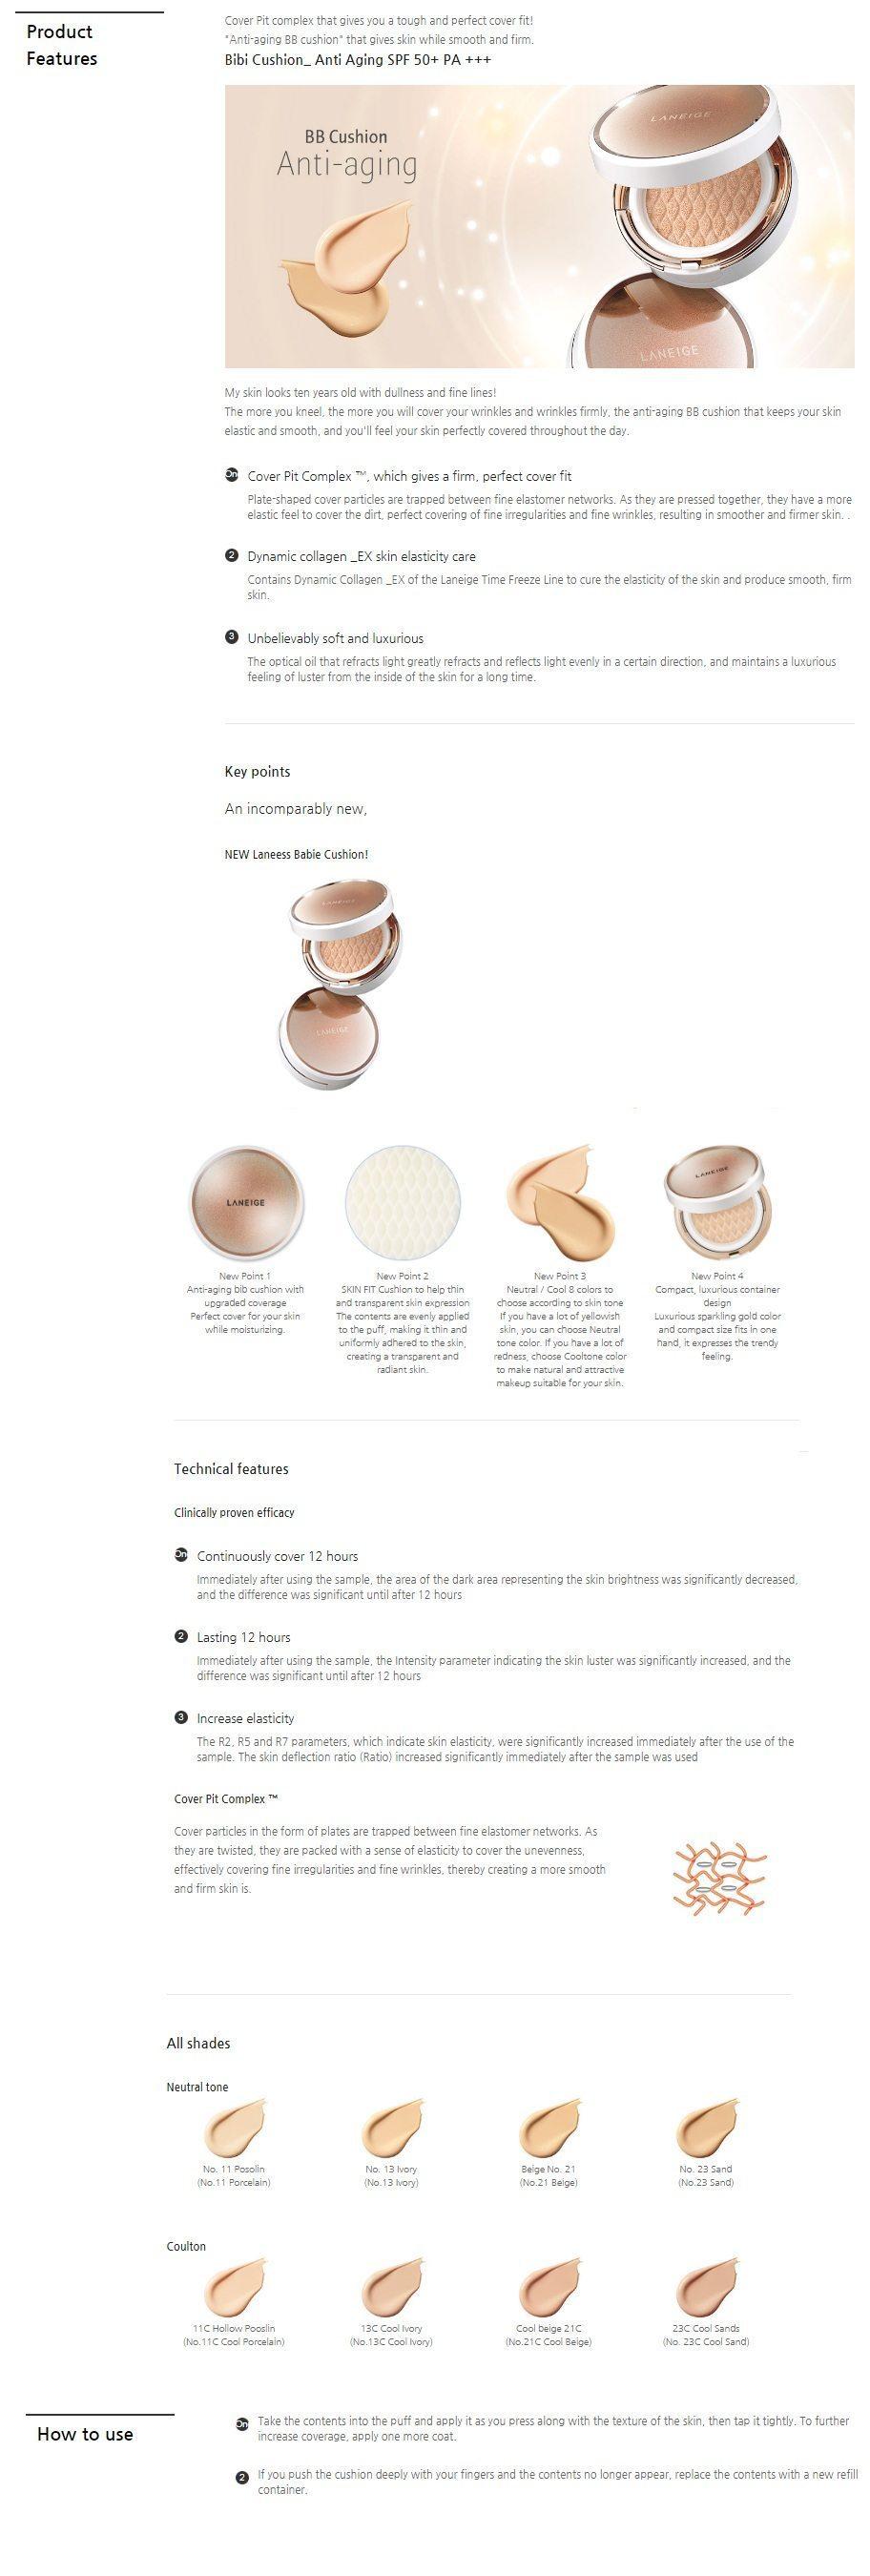 Laneige BB Cushion Anti Aging korean makeup product online shop malaysia macau china1